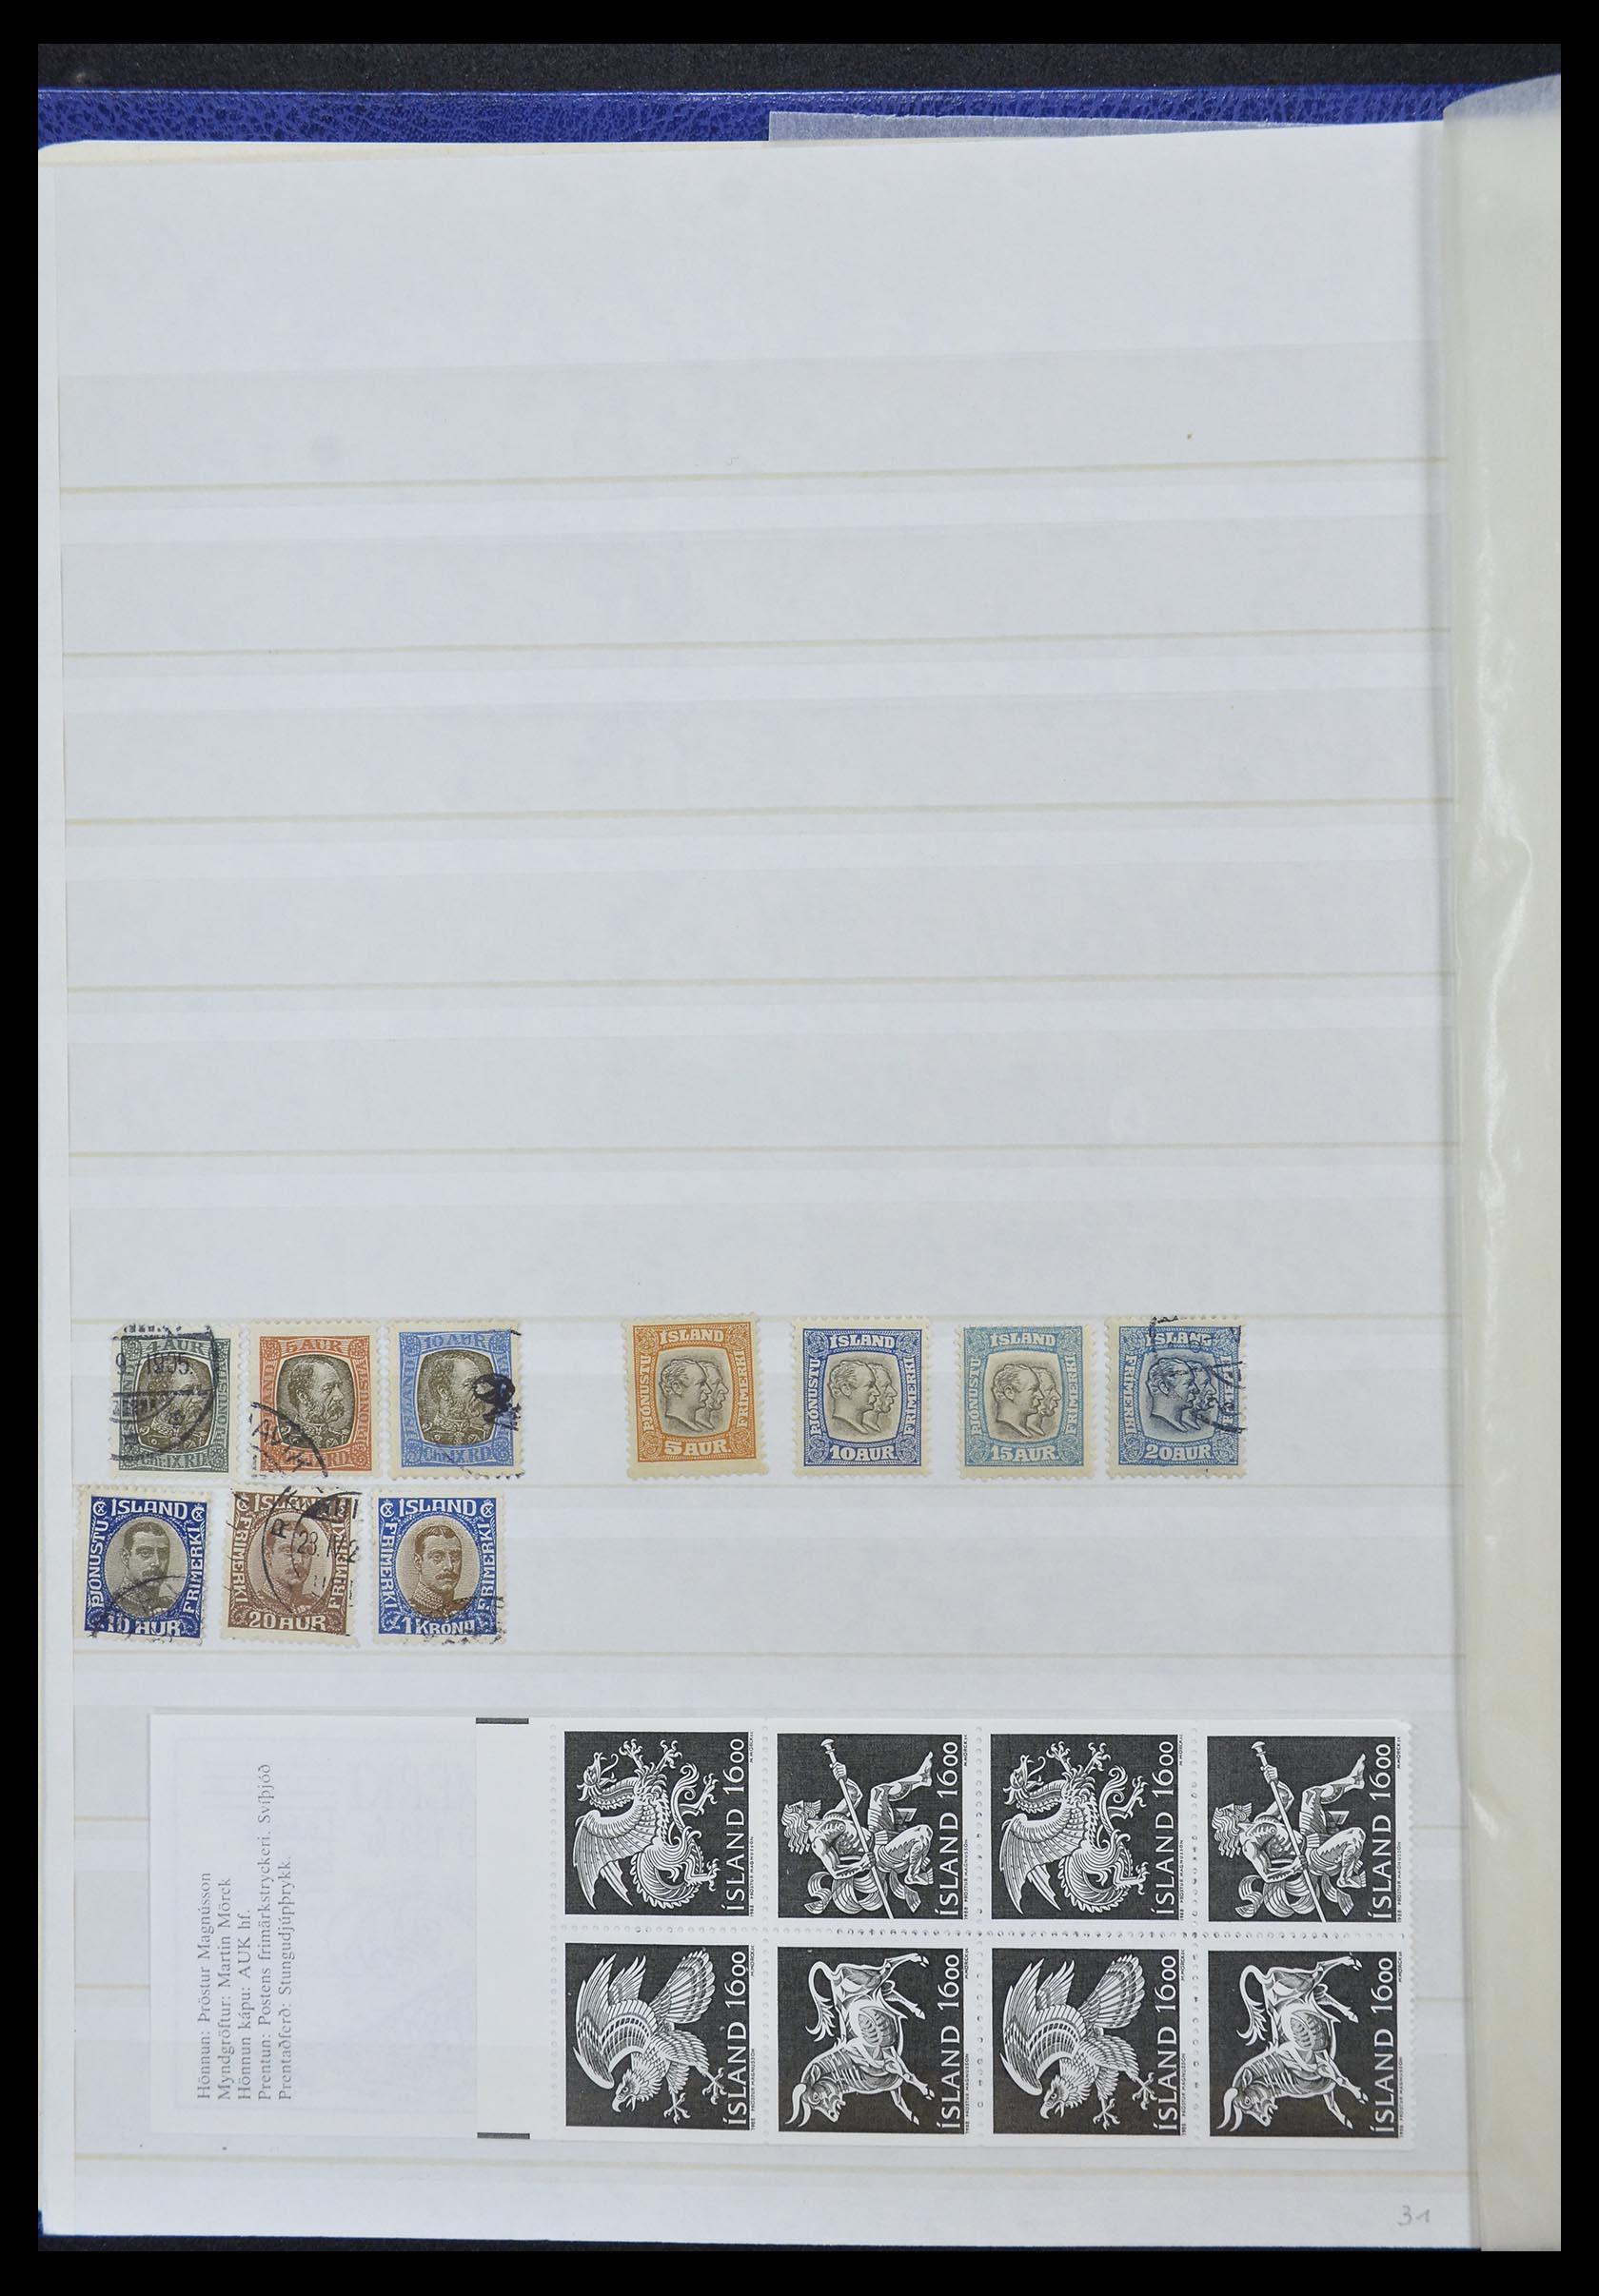 33185 002 - Postzegelverzameling 33184 Finland 1856-1990.